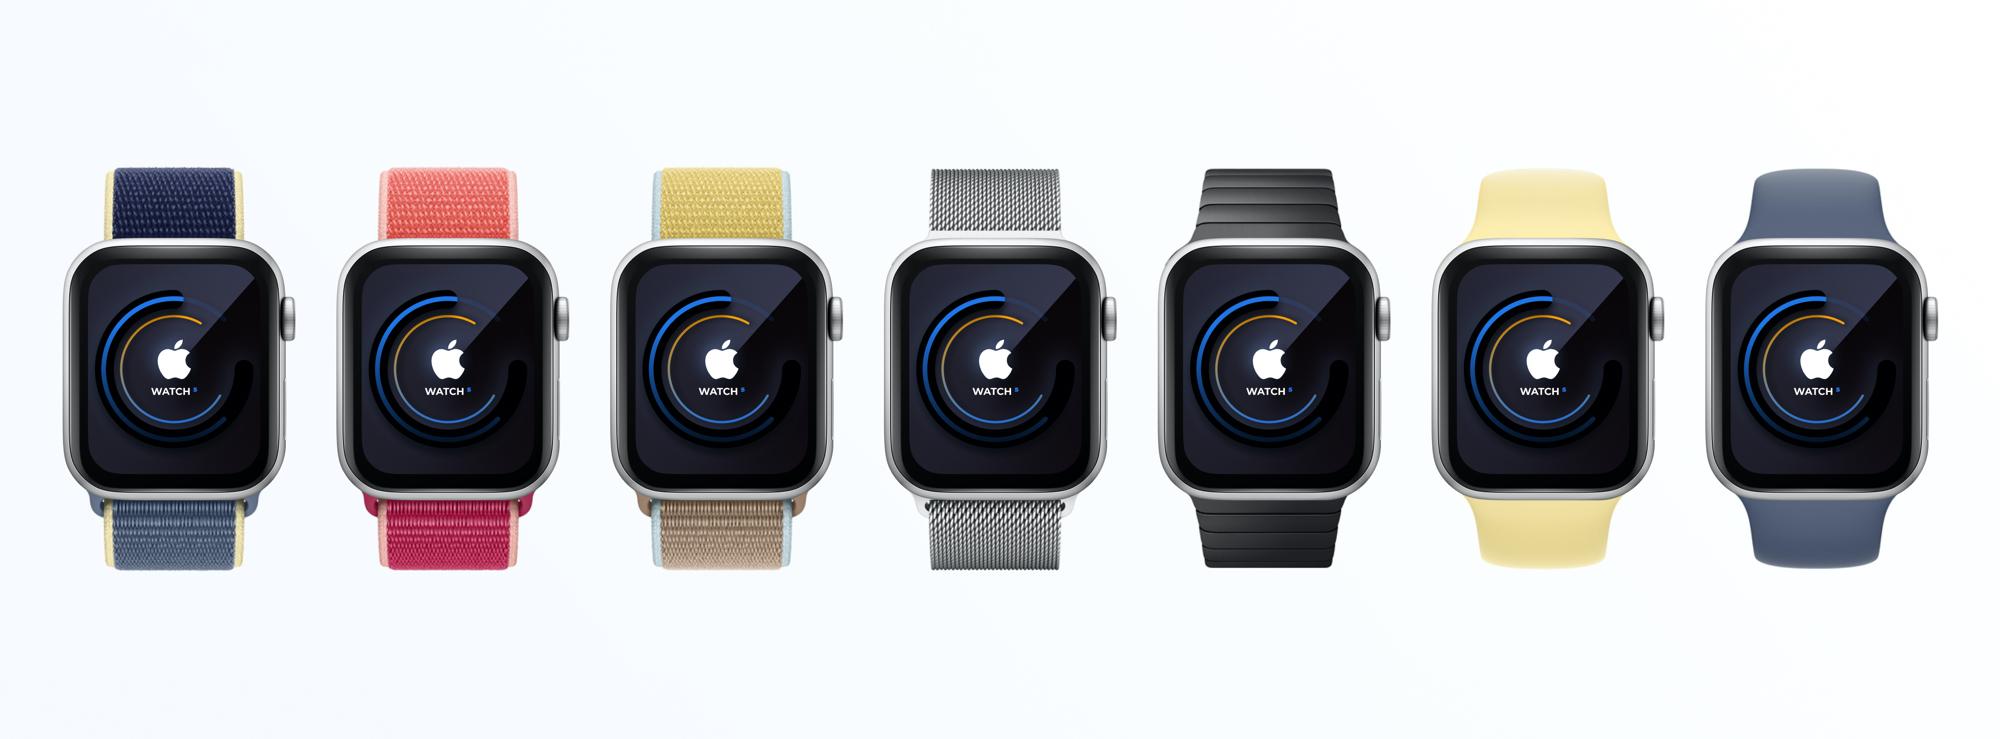 Apple Watch穿戴设备智能手表样机插图